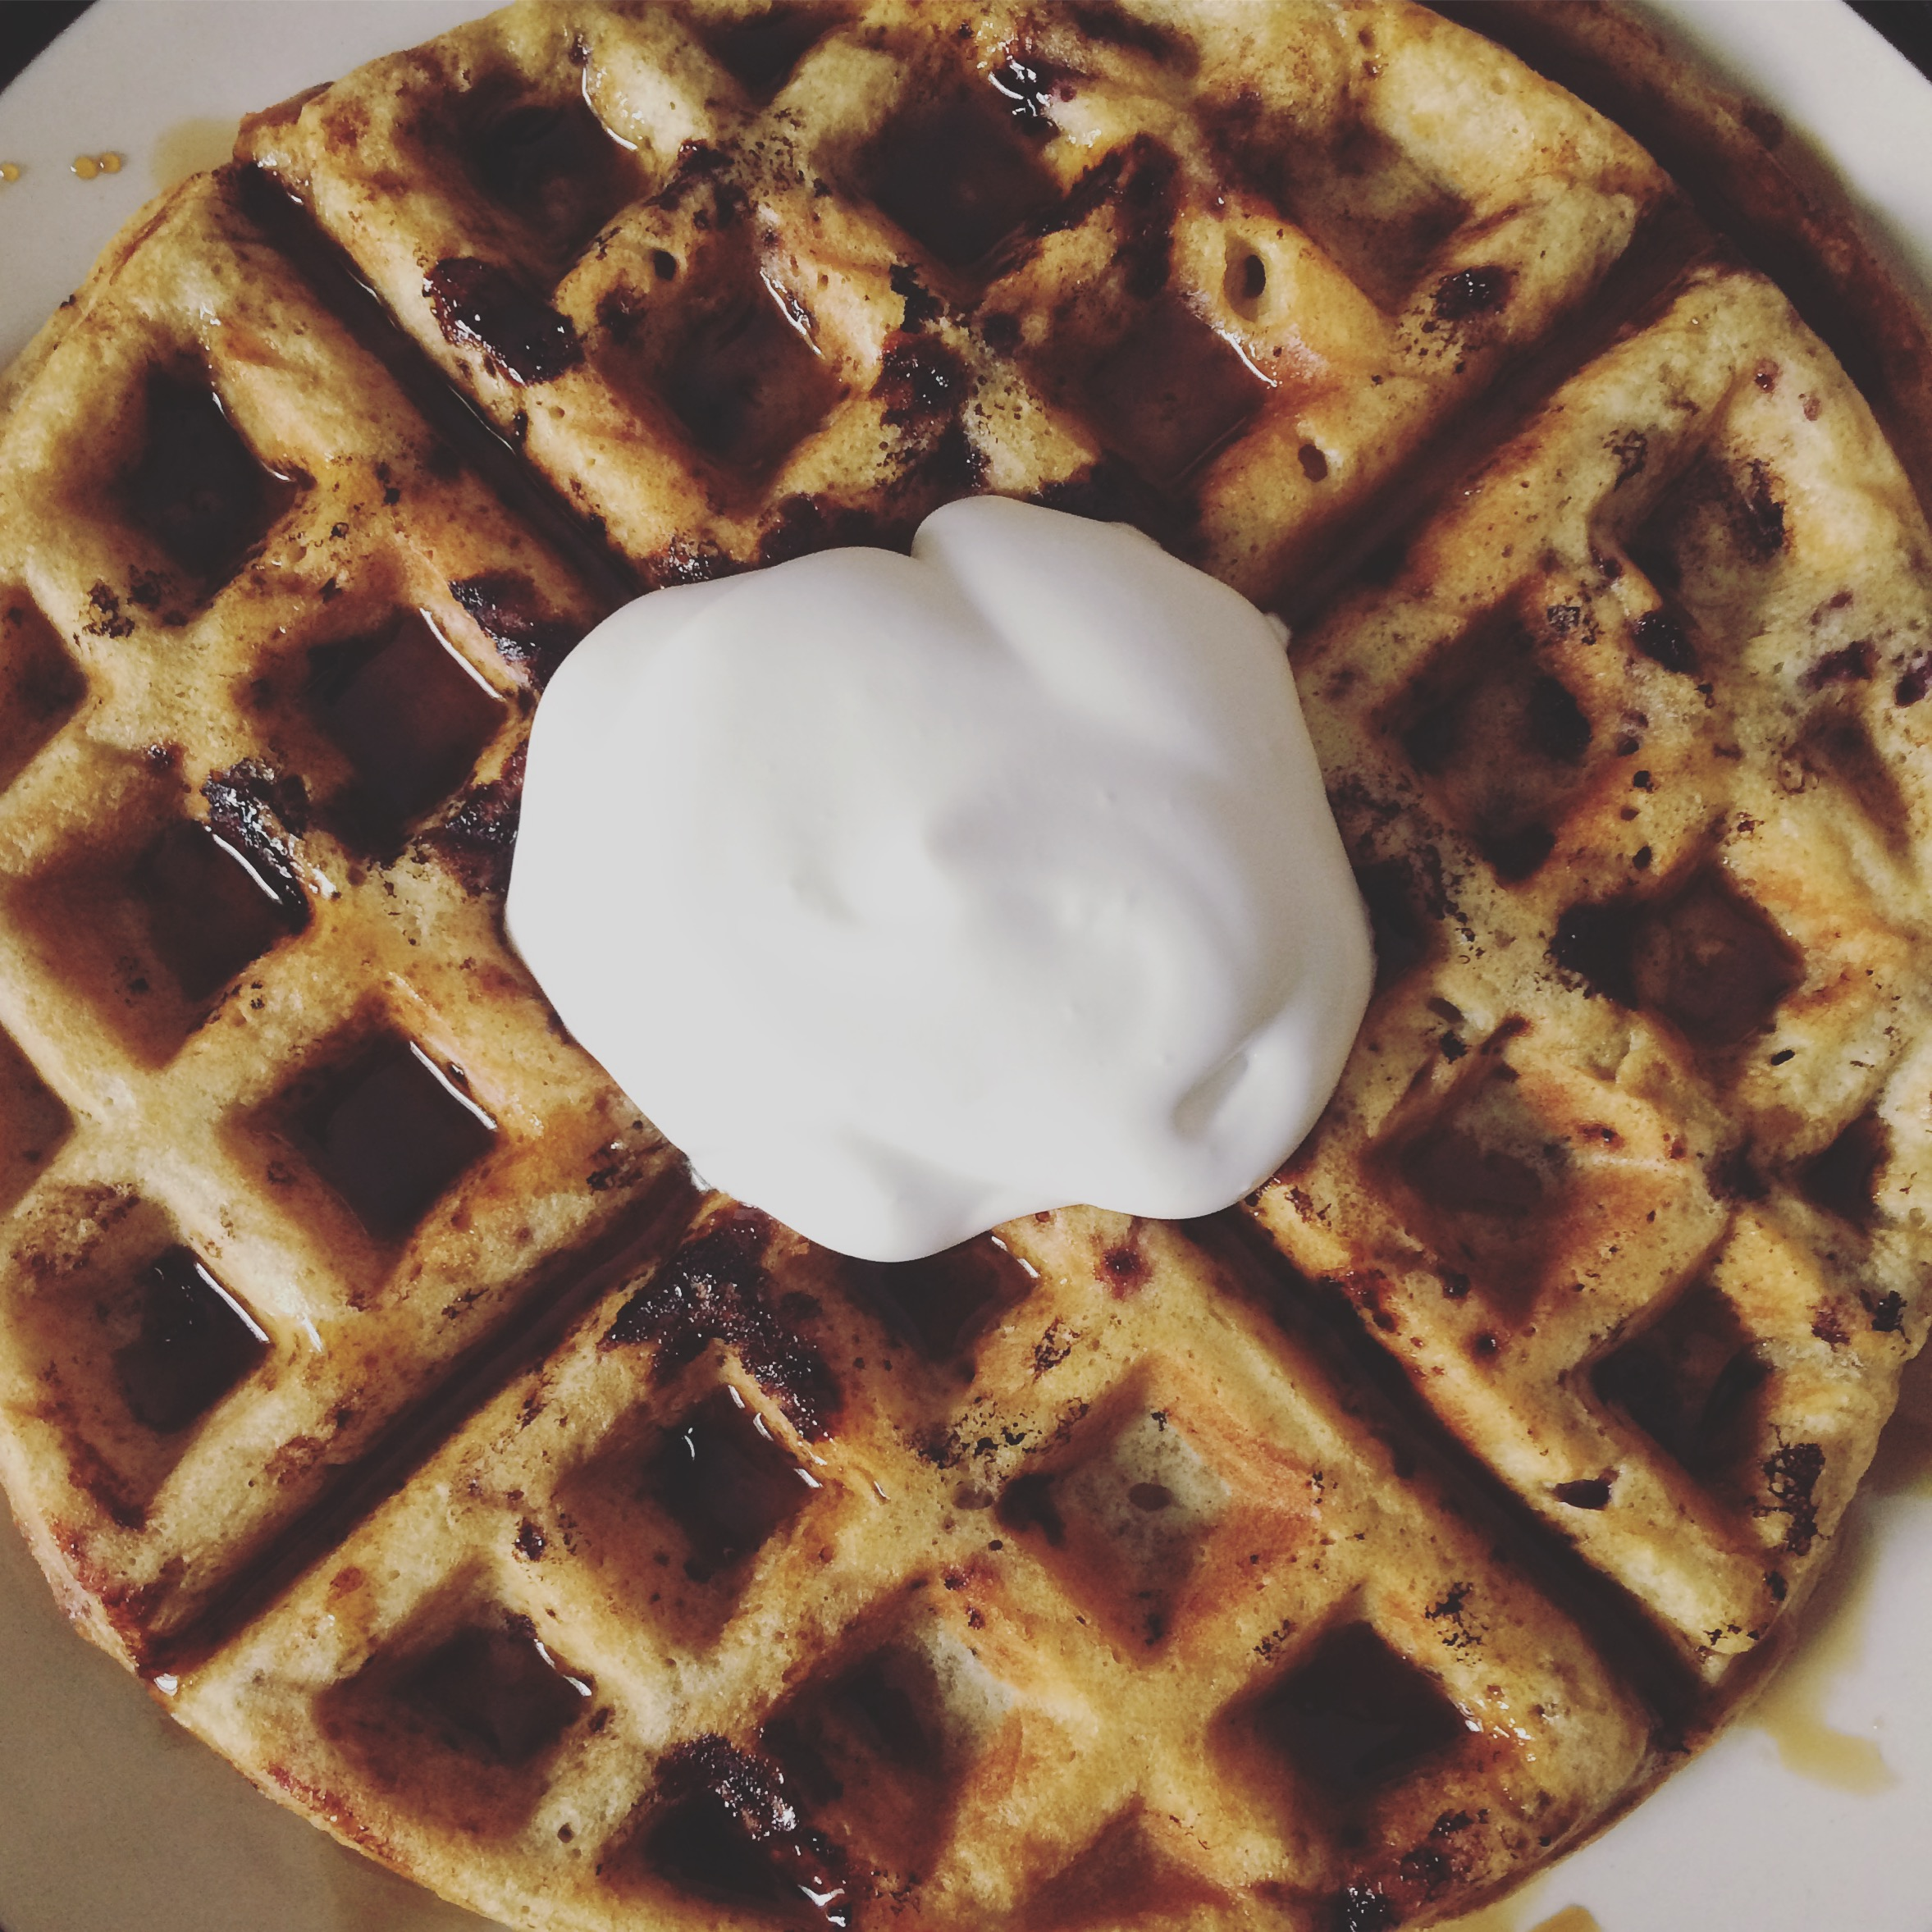 Juneberry waffle